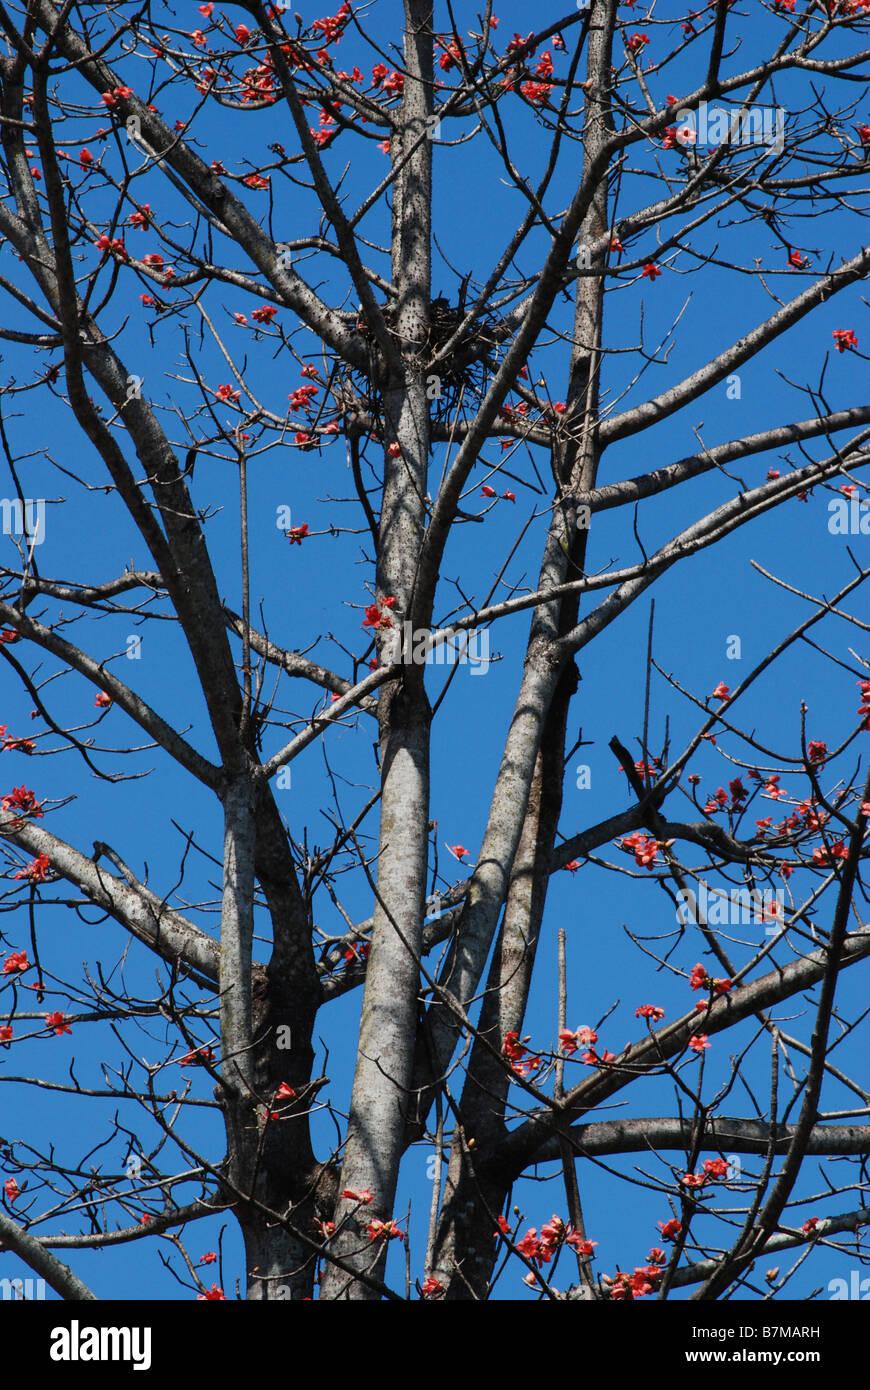 birds,nature,Advertise,Advertisement,Advertise,Advert,Advertiser,Advertising,art.animation,3D animation,trees,kerala,kollam - Stock Image